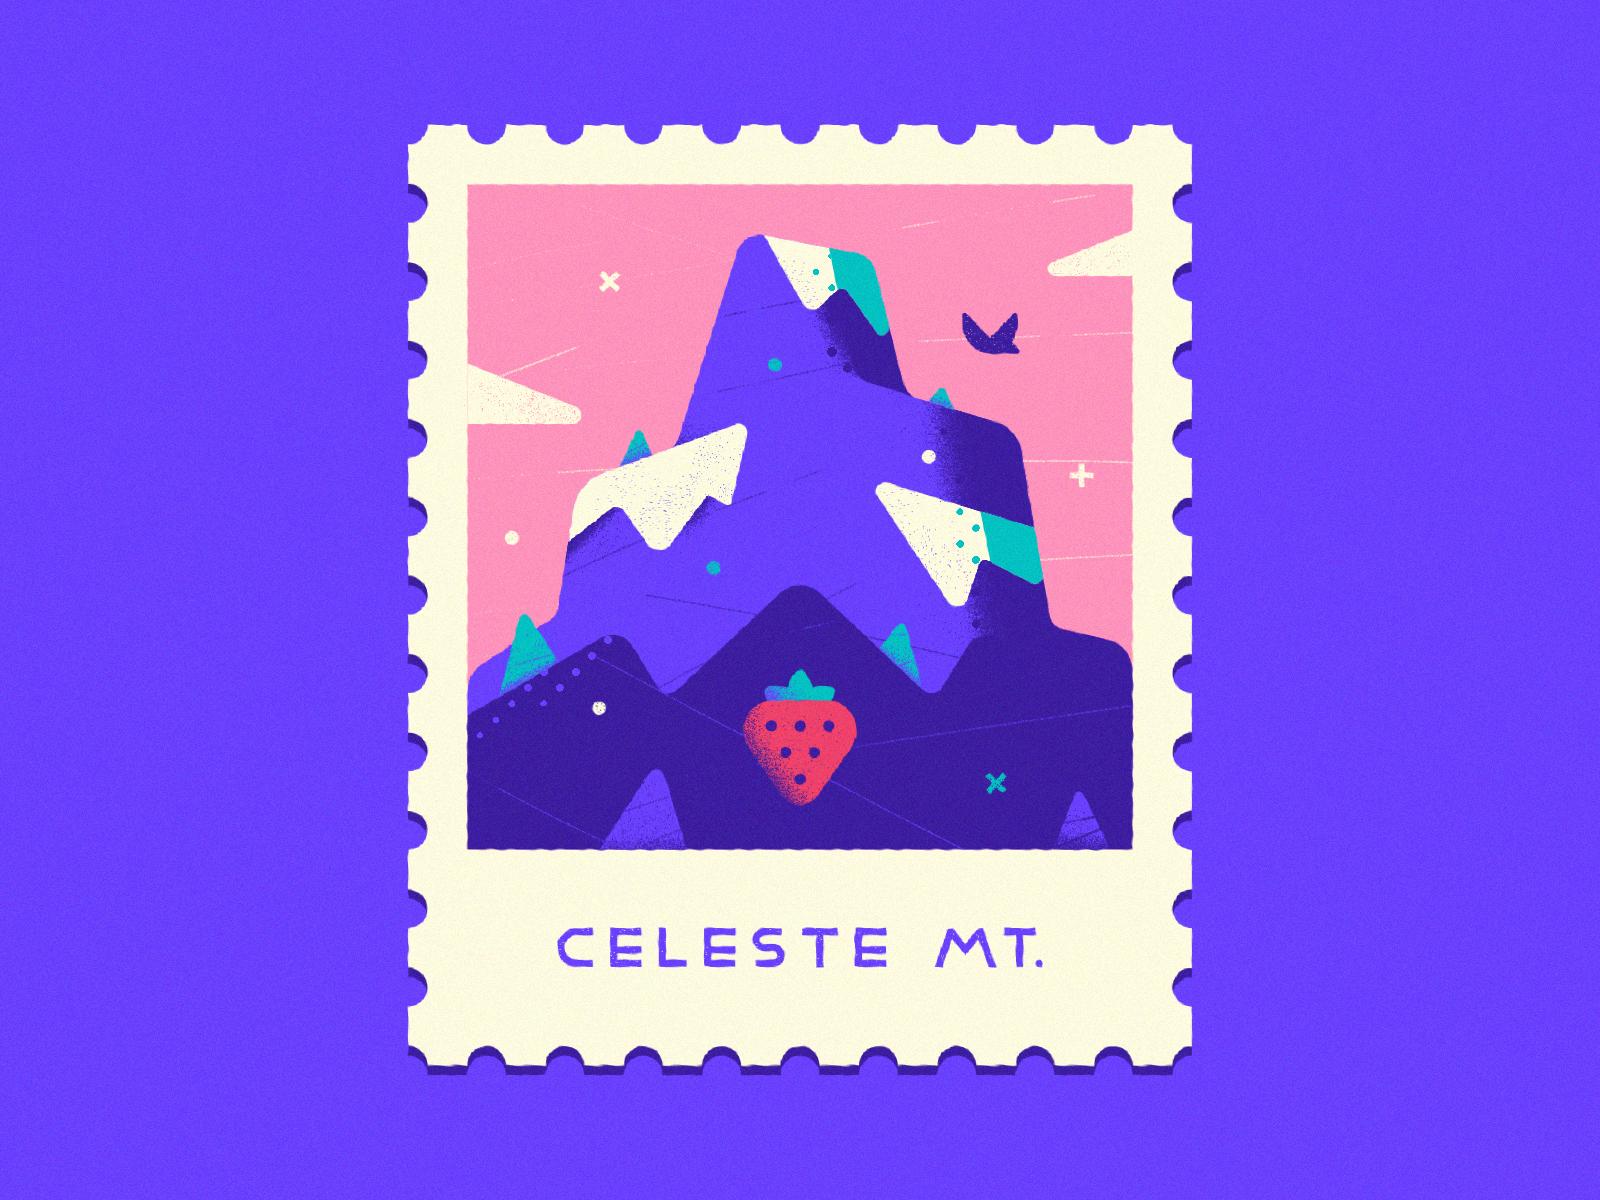 Celestemountain